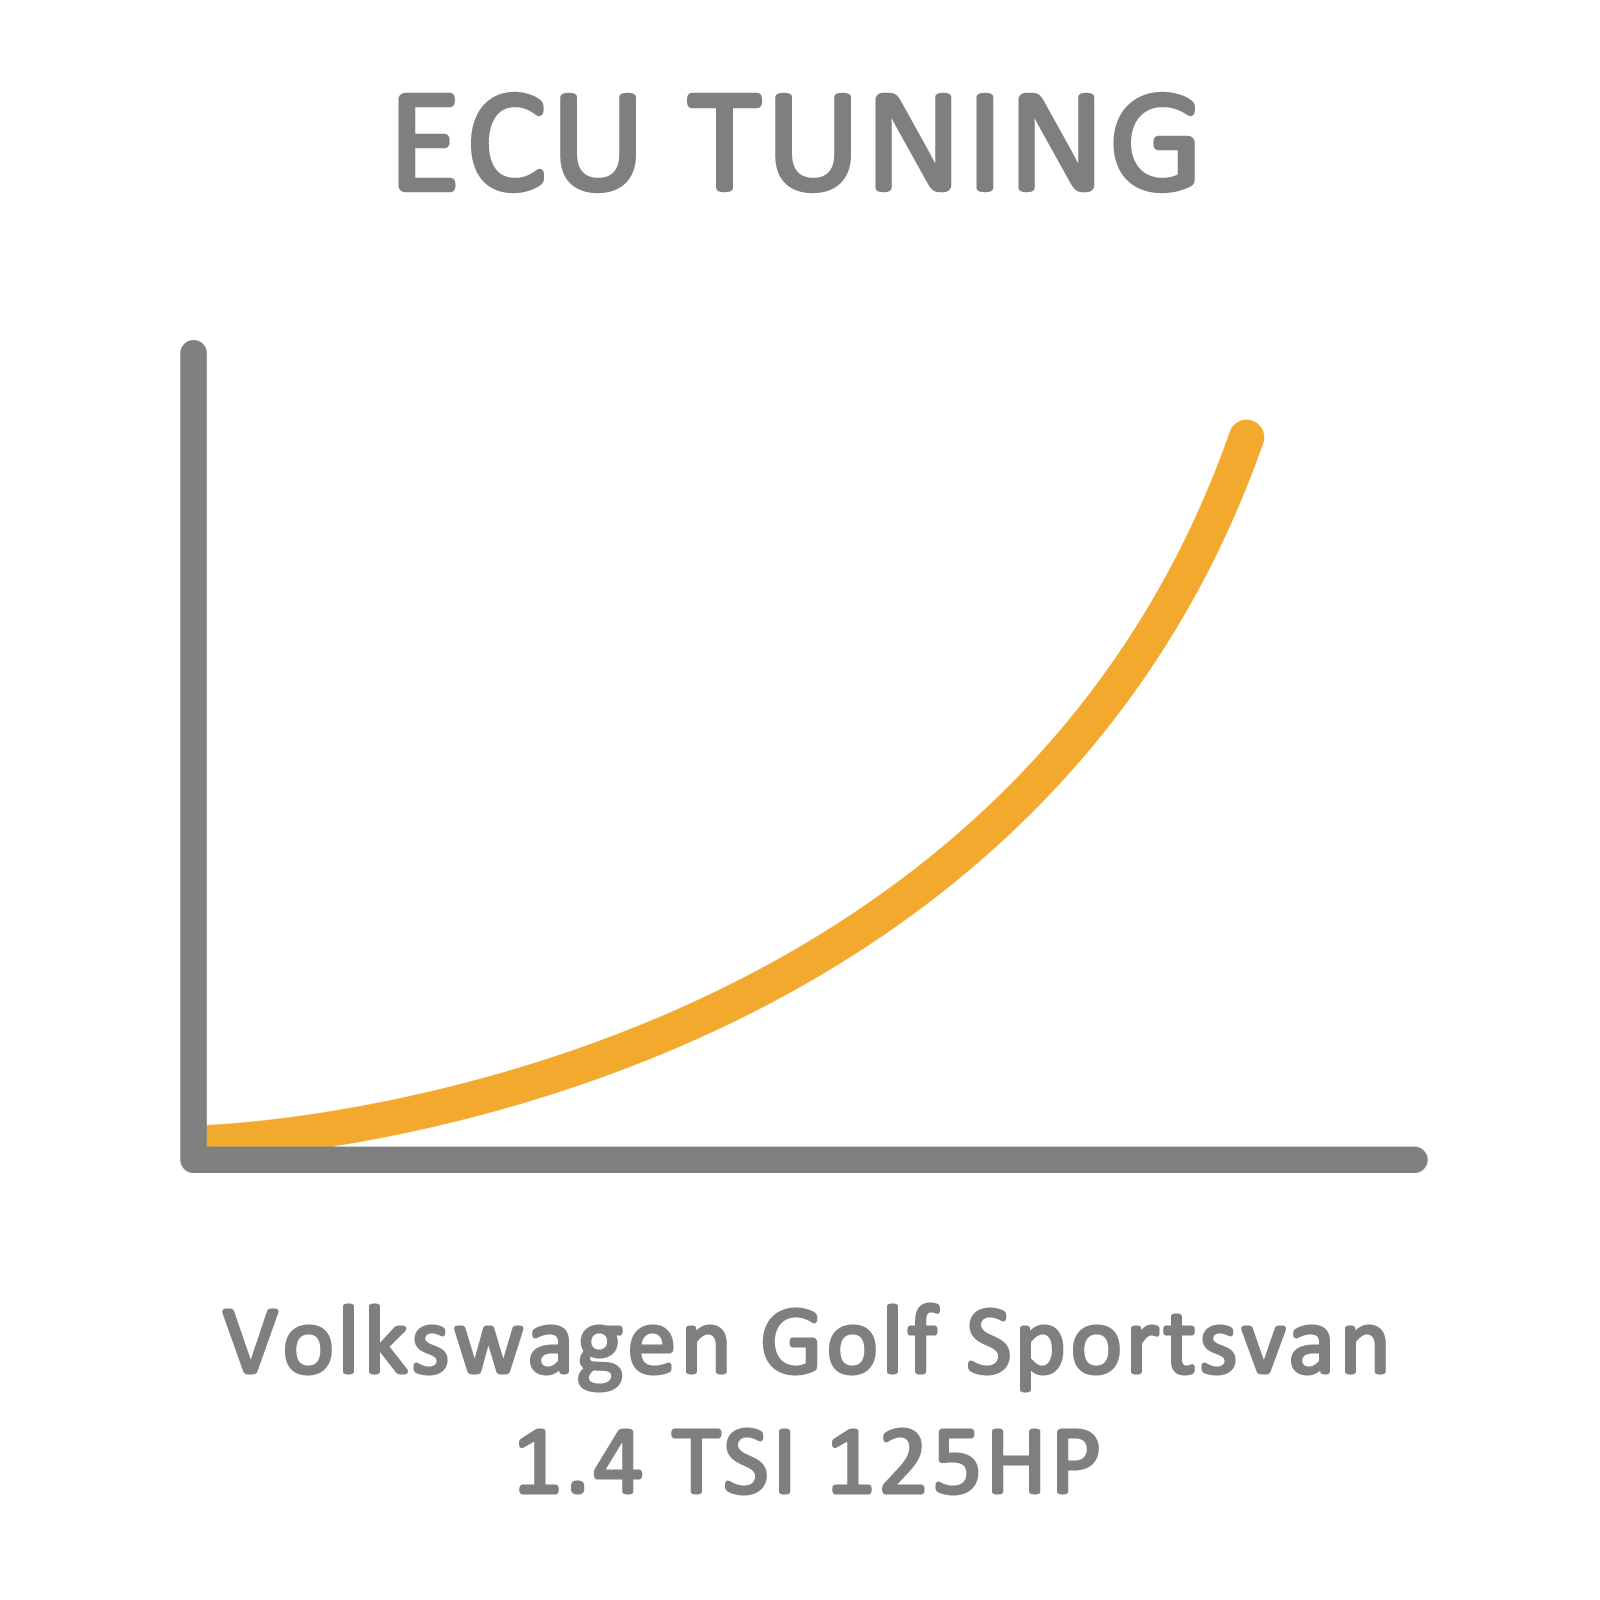 Volkswagen Golf Sportsvan 1.4 TSI 125HP ECU Tuning